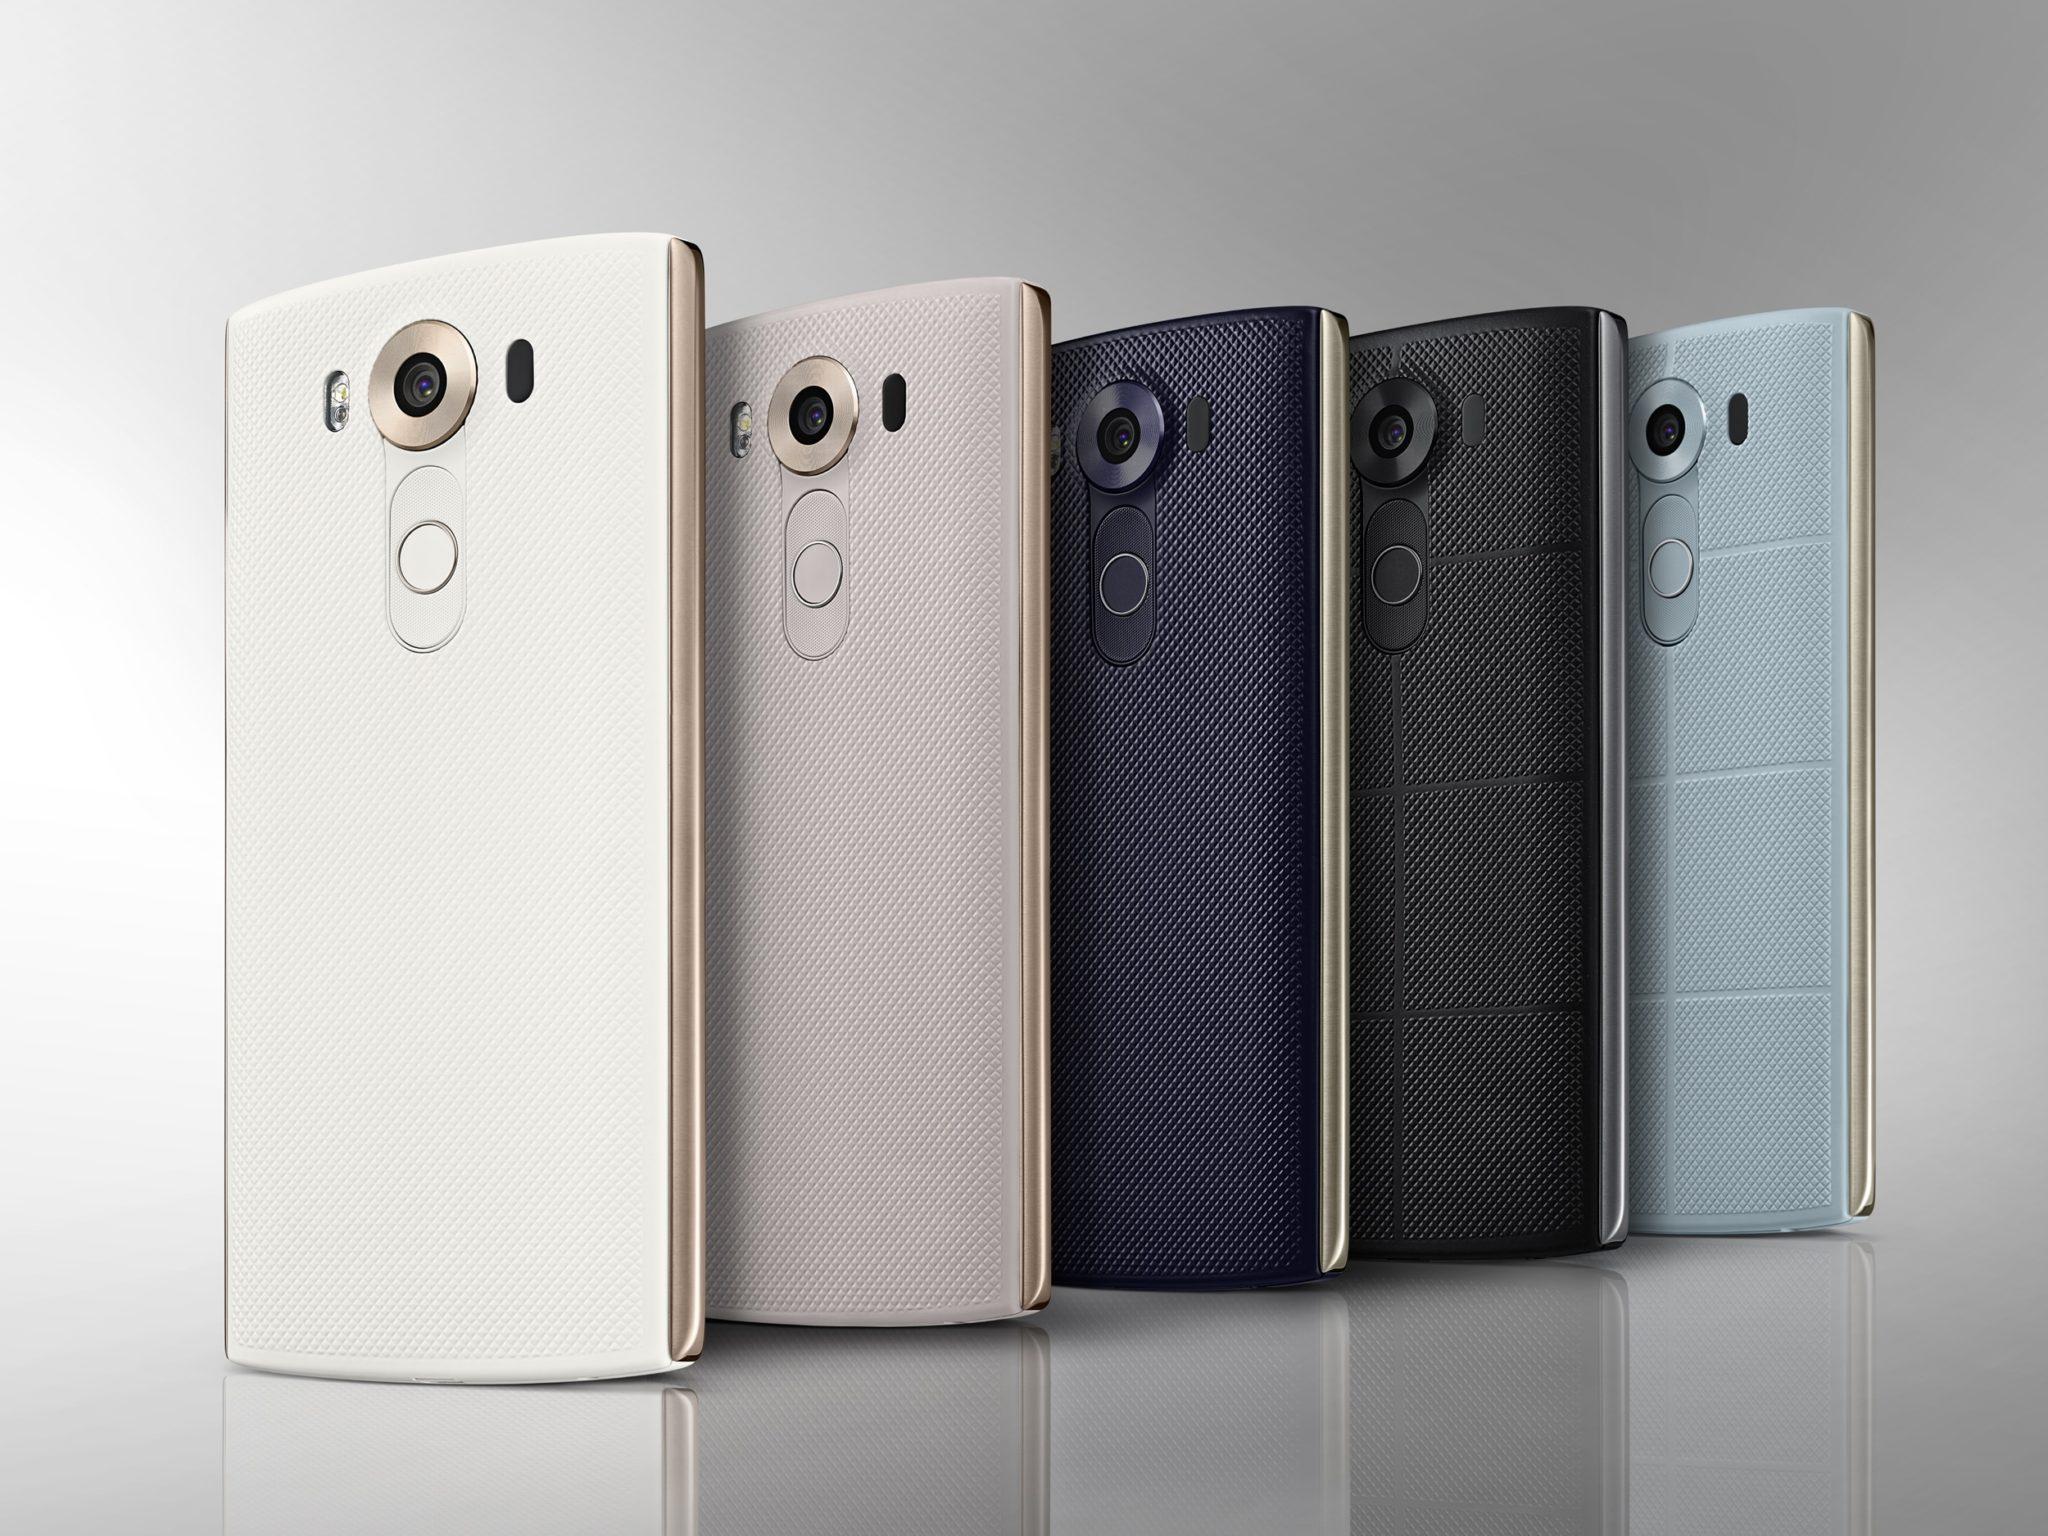 LG V10 – skutečný top model s inovacemi